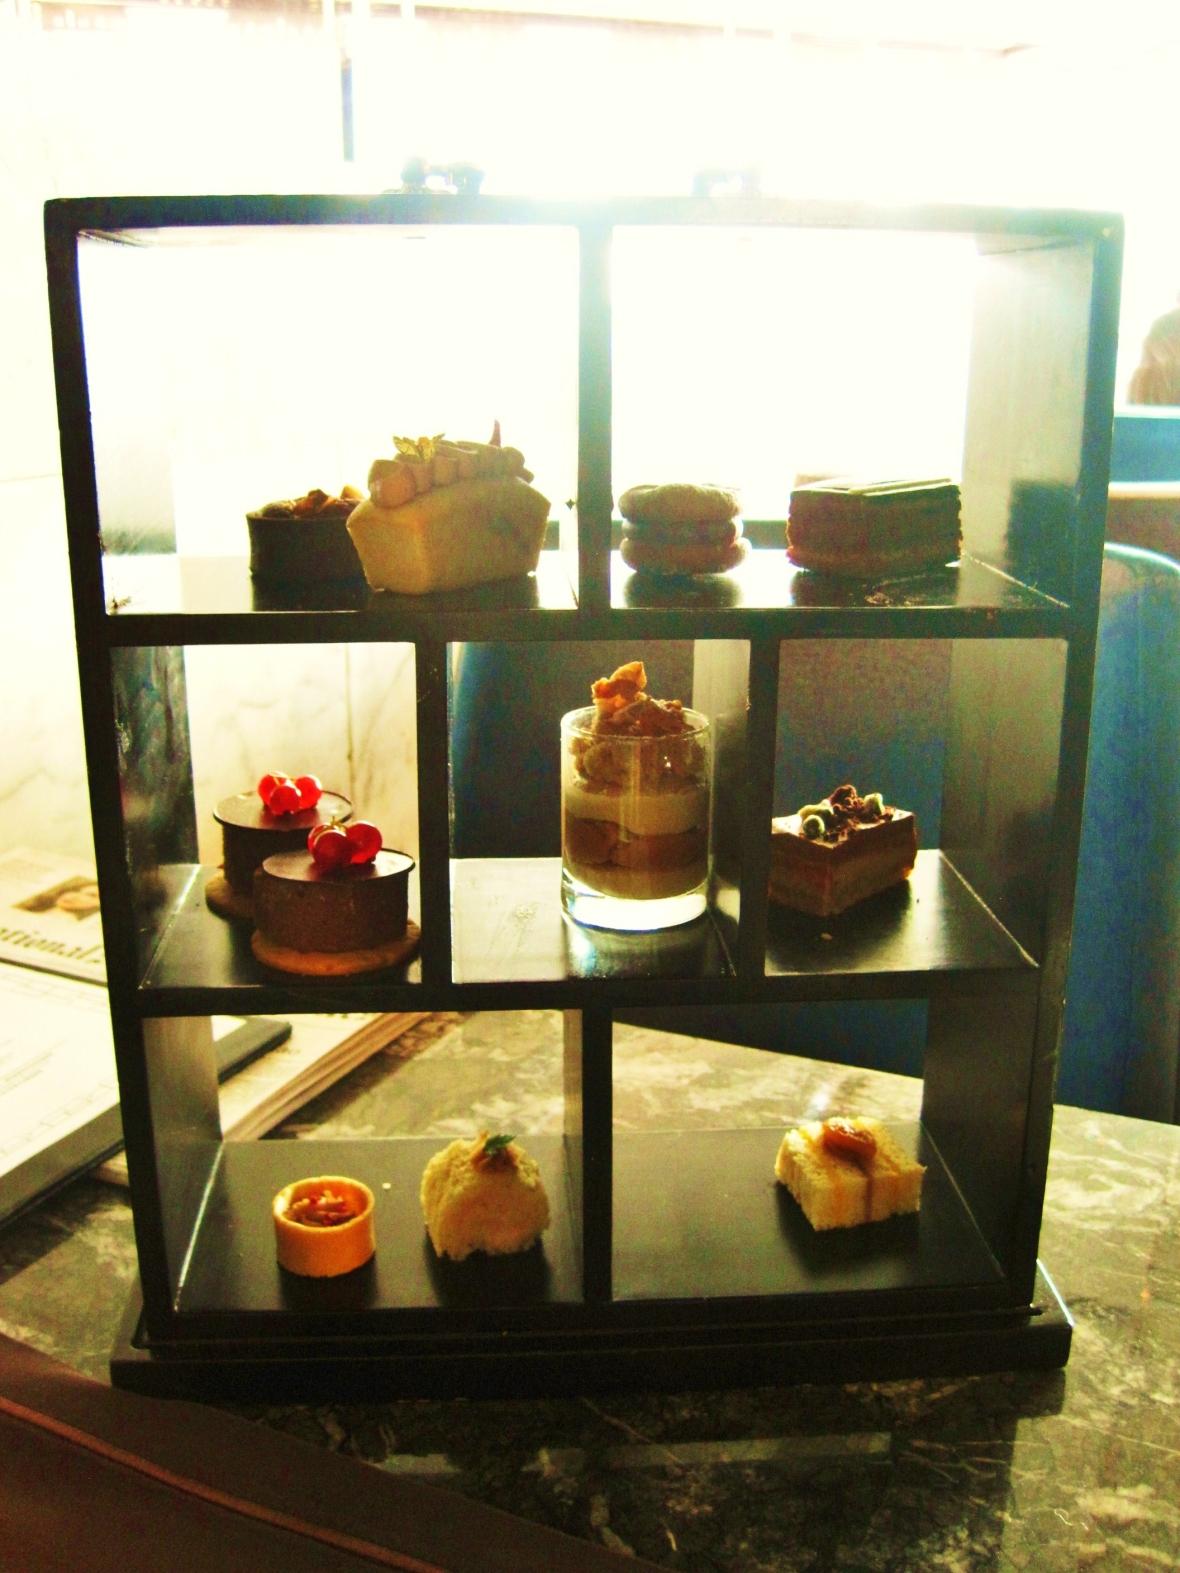 The Ritz Carlton Hong Kong - the afternoon tea